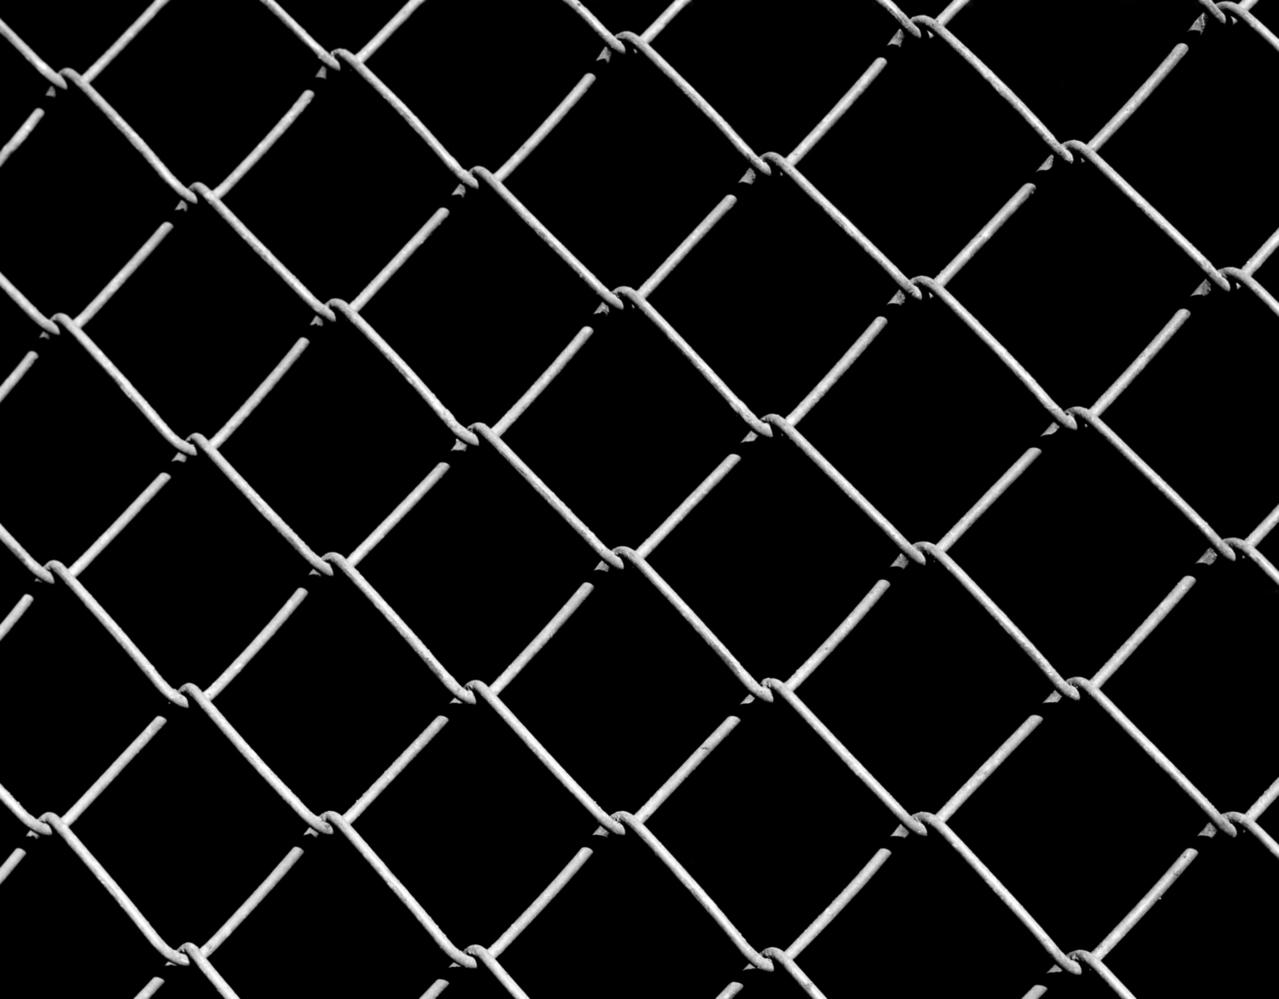 fence-1621573-1279x1000